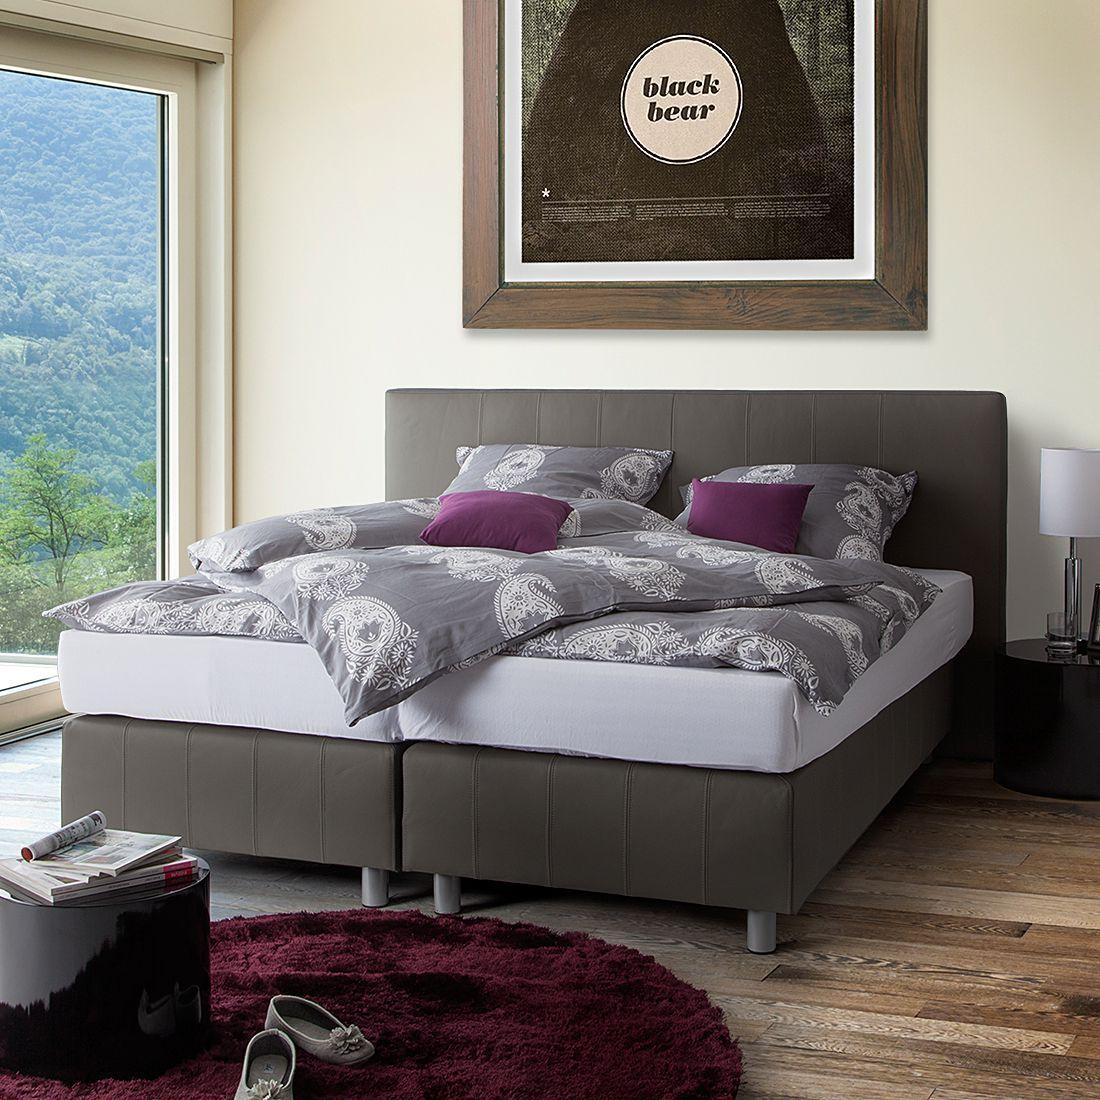 Boxspringbett Atlanta Echtleder Schlafzimmermobel Haus Deko Bett